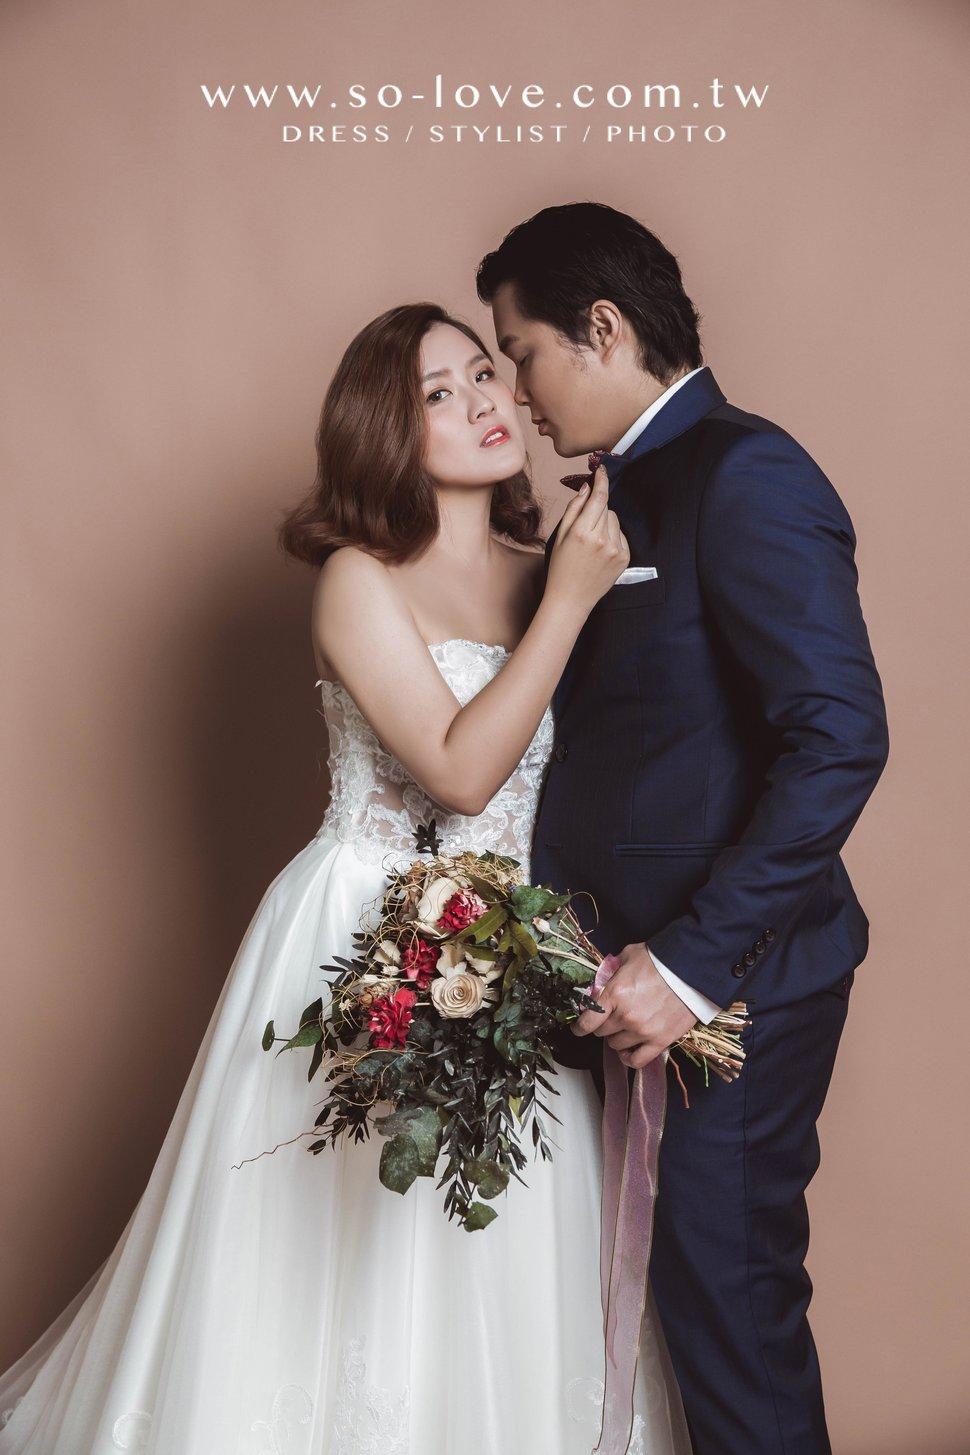 YCG2B8171 - So.Love Wedding 樂樂蕾絲《結婚吧》